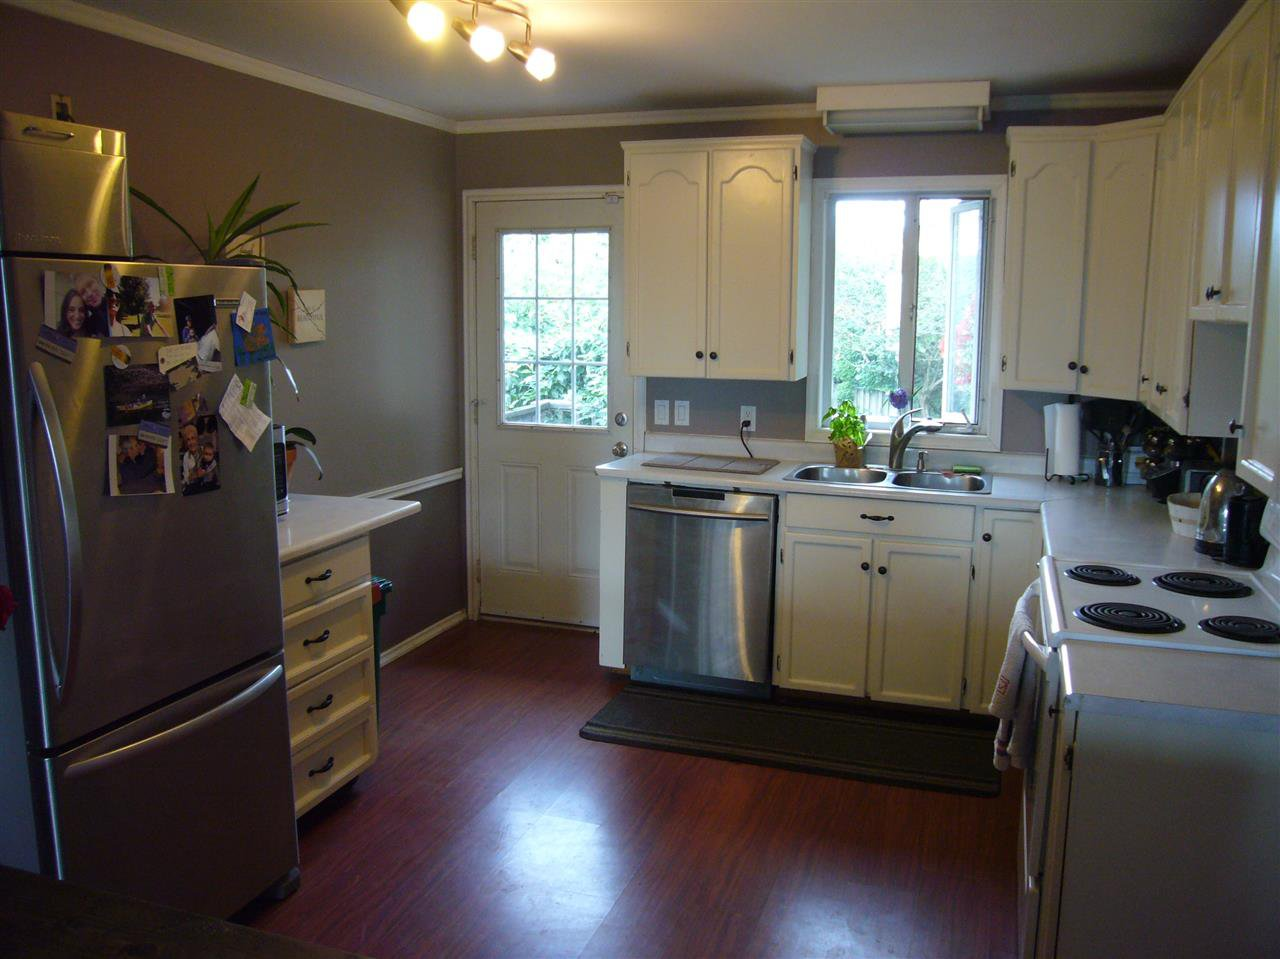 Photo 4: Photos: 6580 EVANS Road in Sardis: Sardis West Vedder Rd House for sale : MLS®# R2085581